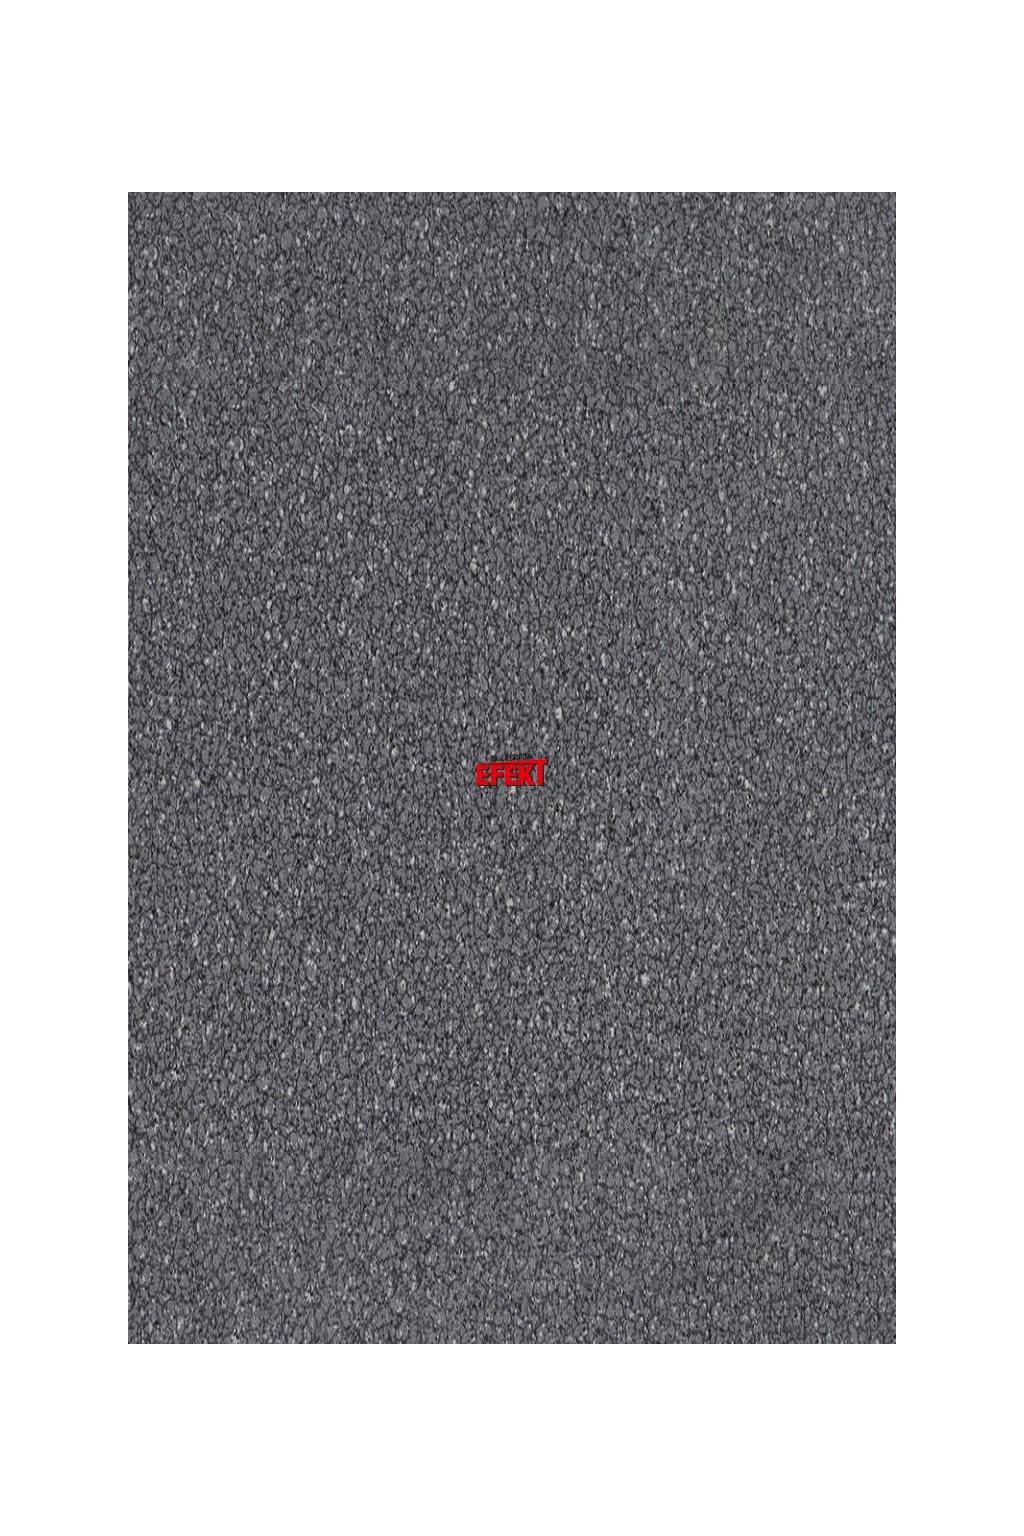 Gerflor Timberline Pixel Black 2179